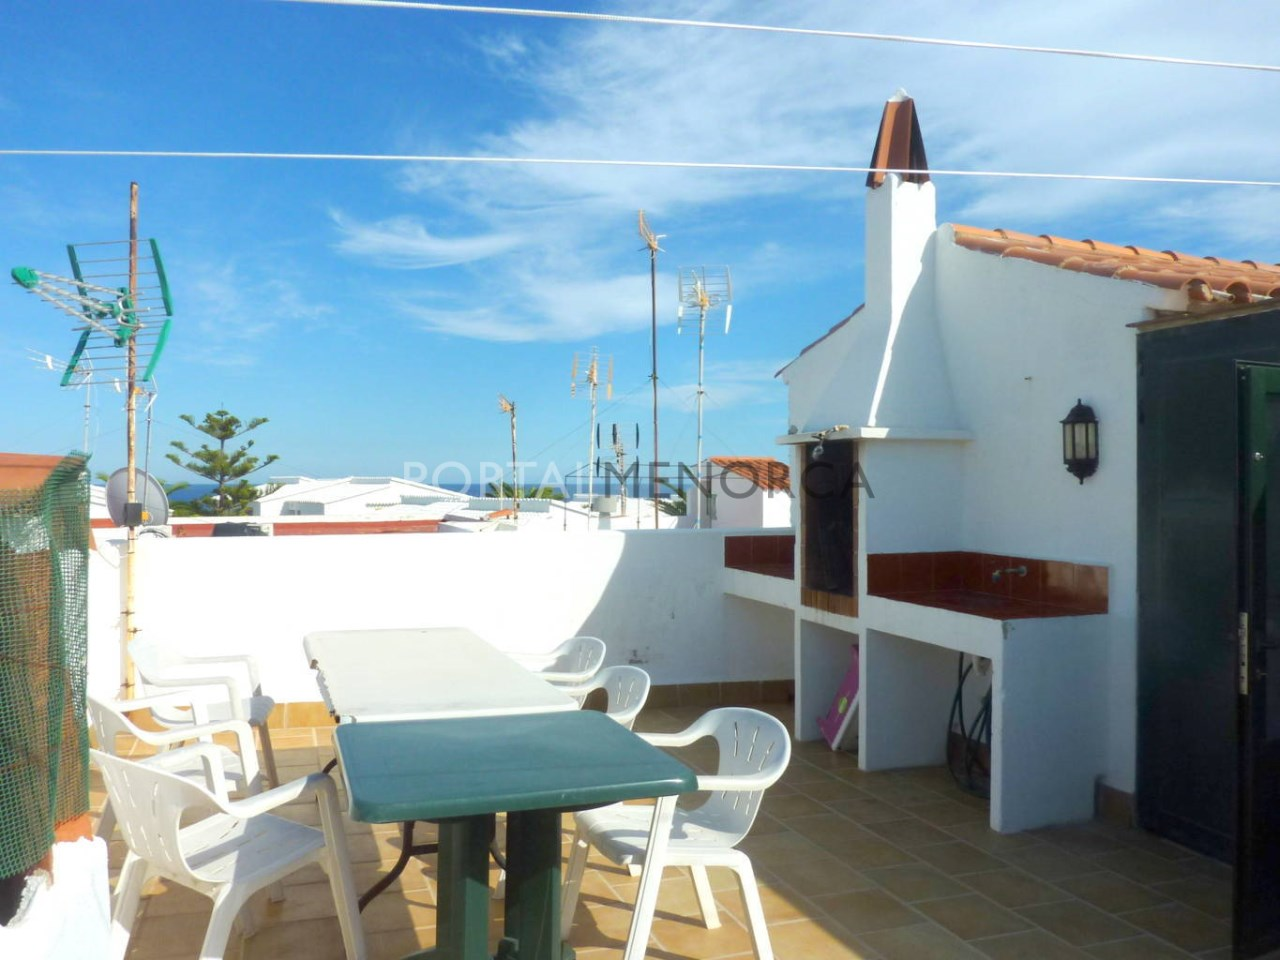 Apartment for sale in S'Algar, Menorca with sea view